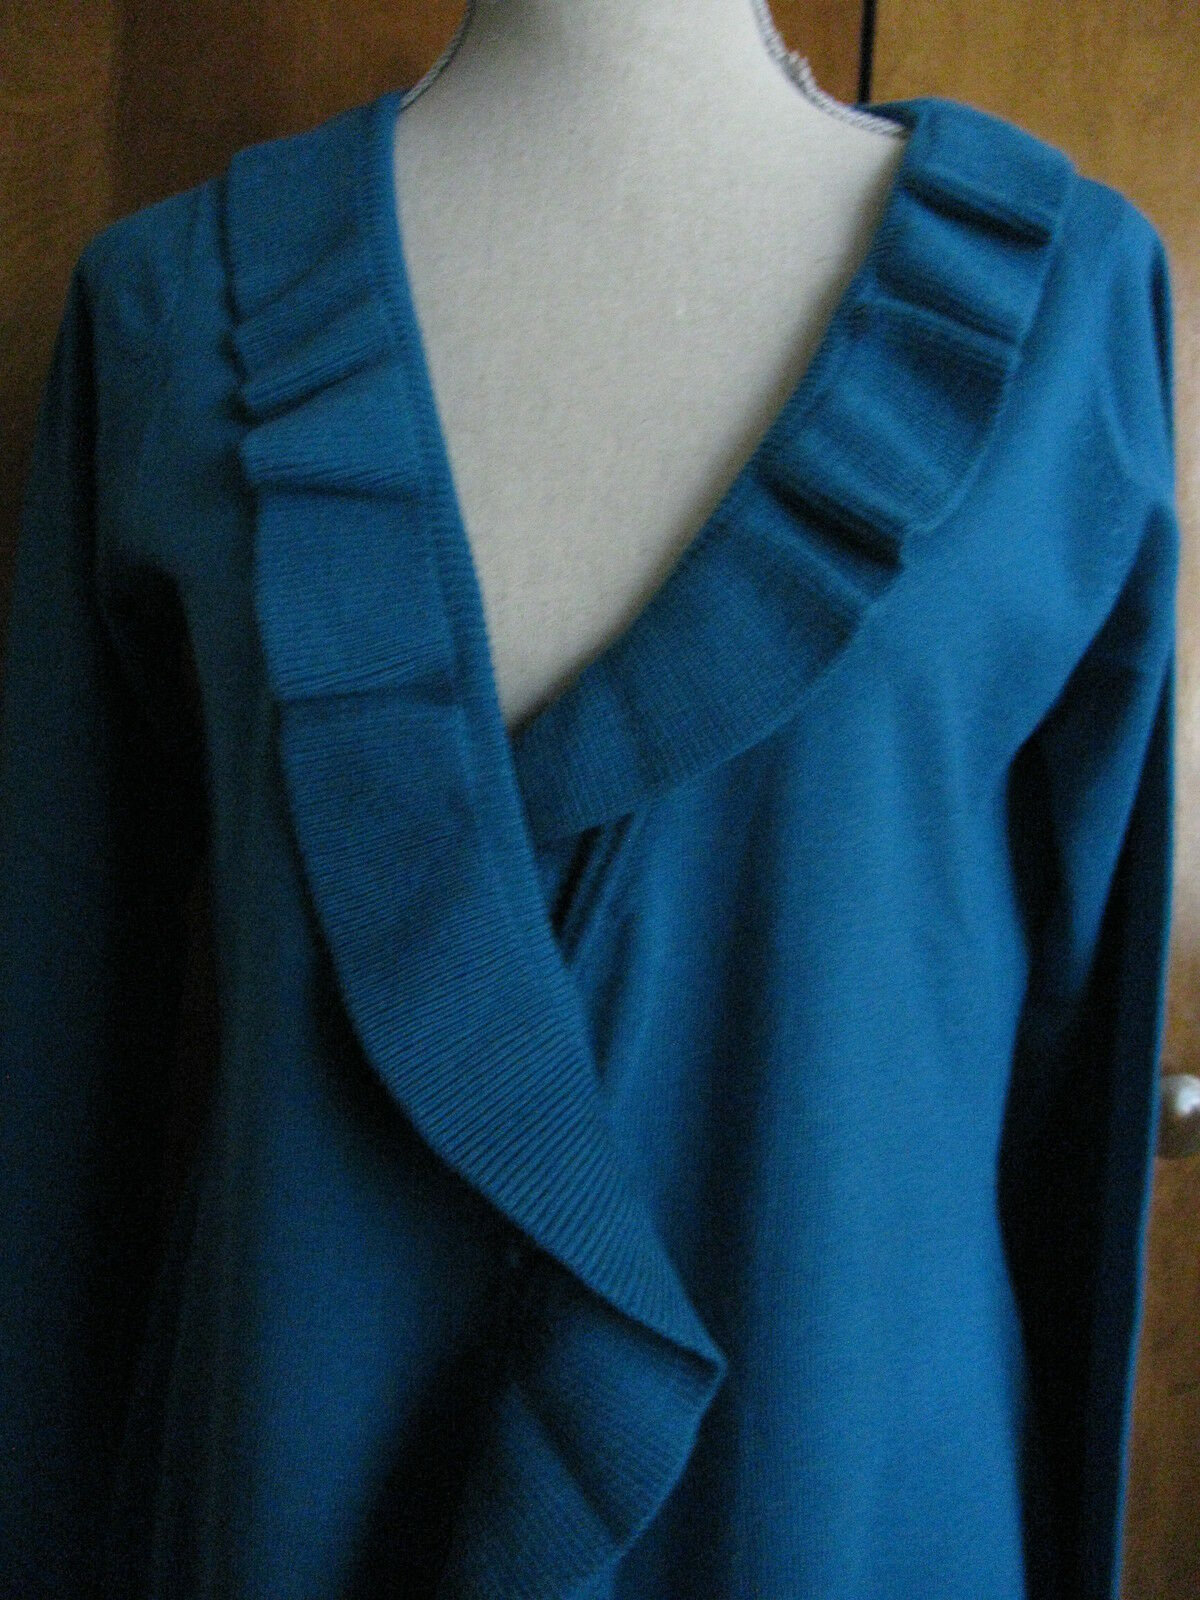 One A women's mgoldccan bluee ruffle detailed  long cardigan cardigan cardigan Sz Large NWT 177bef